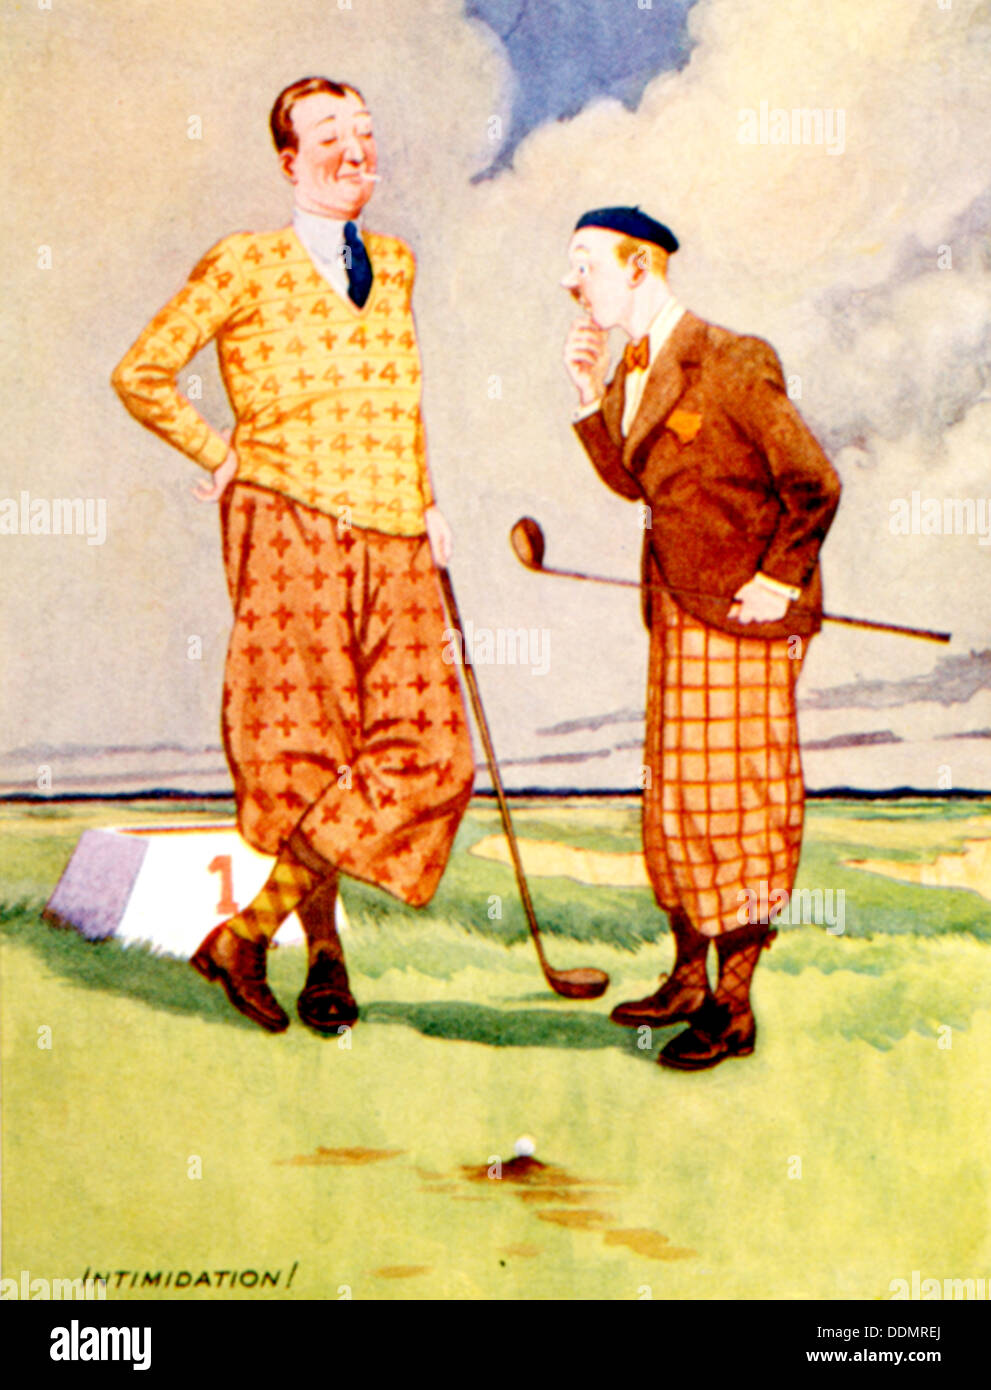 Golfing cartoon, British, c1920s. - Stock Image